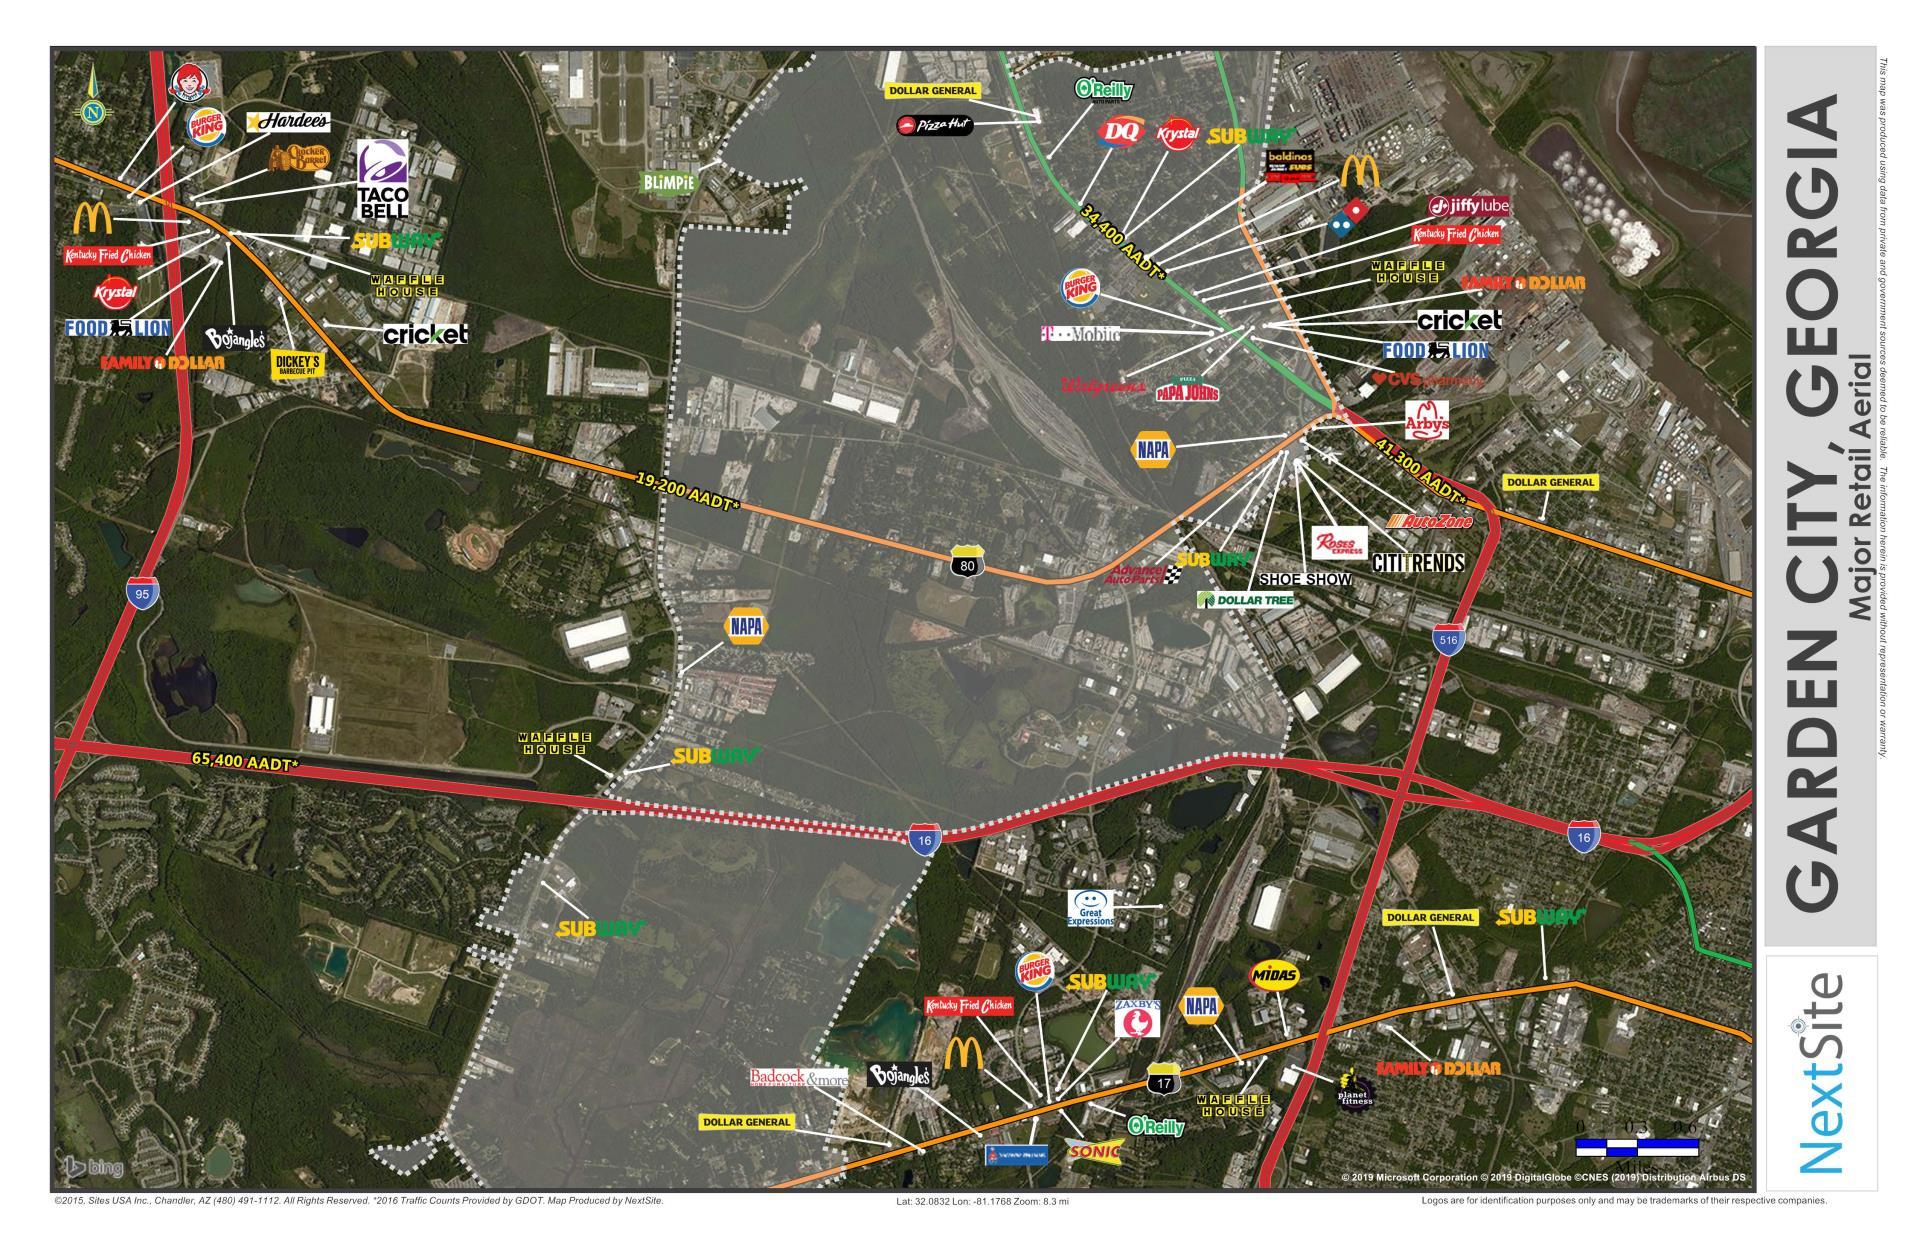 Economic Development - A Growing City | Garden City, GA